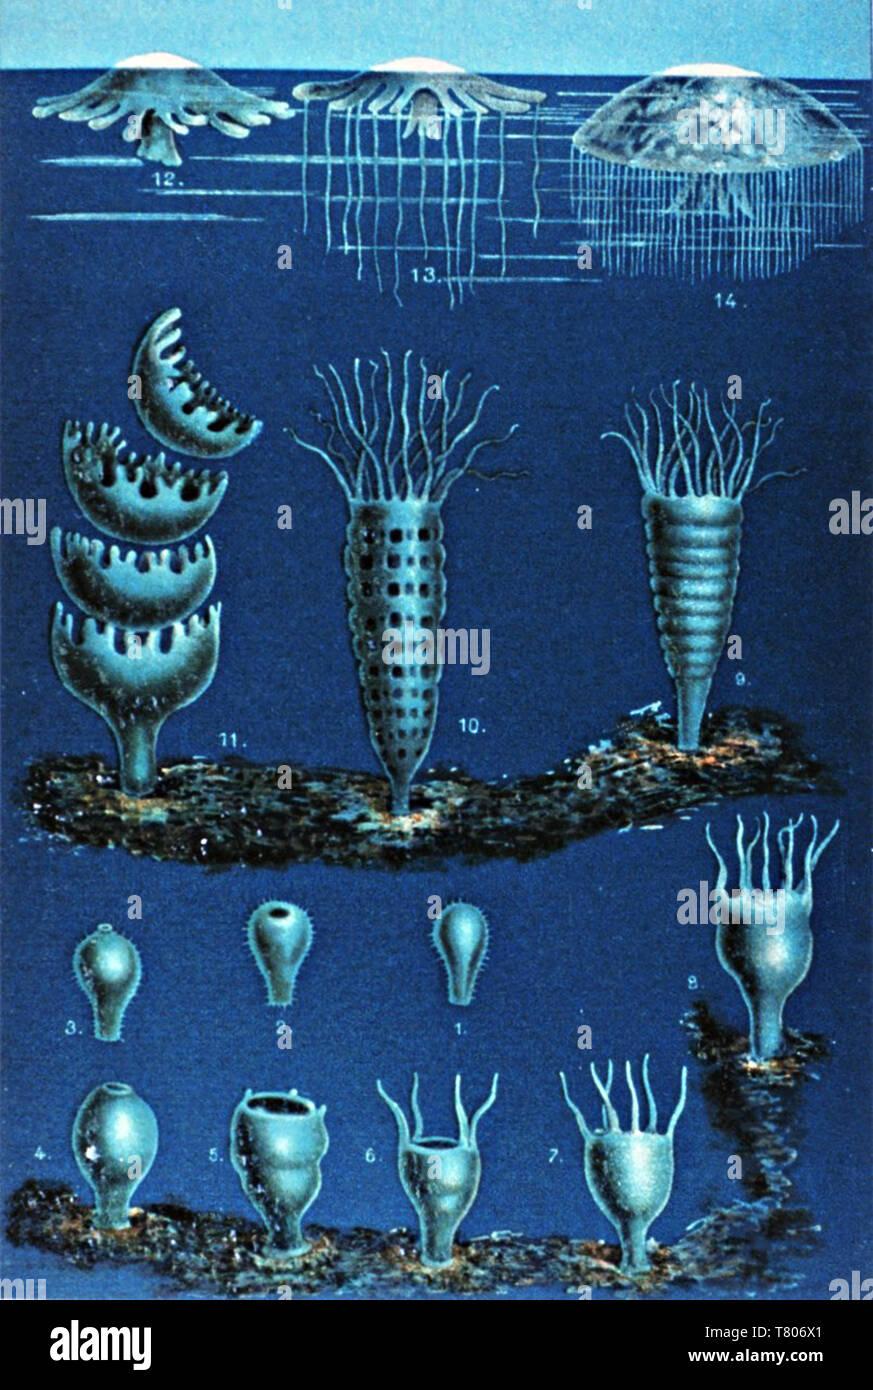 Matthias Jakob Schleiden, Life Cycle of Scyphozoas, 1869 Stock Photo